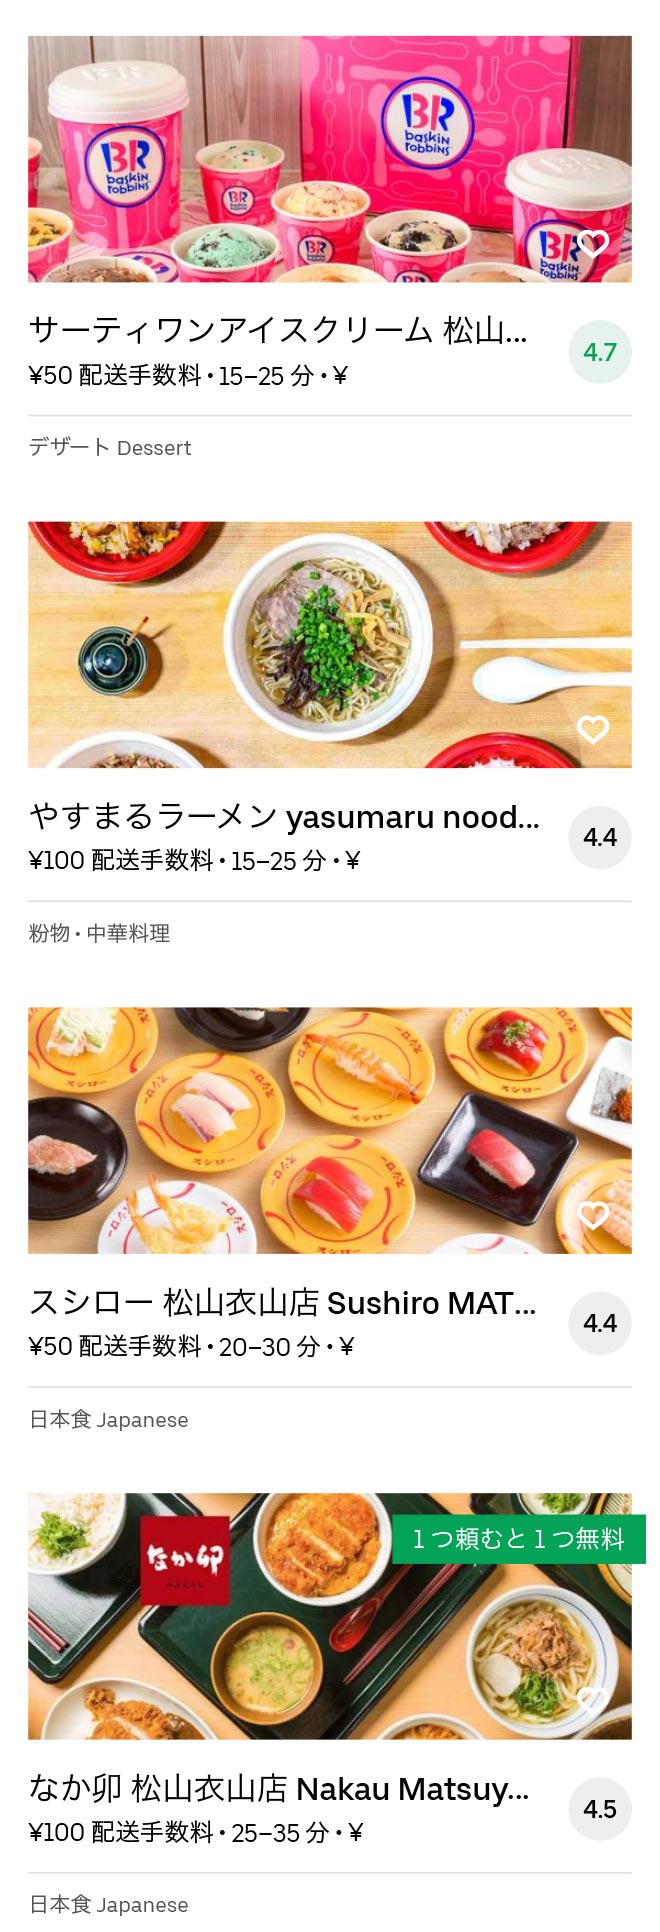 Matsuyama menu 2010 10